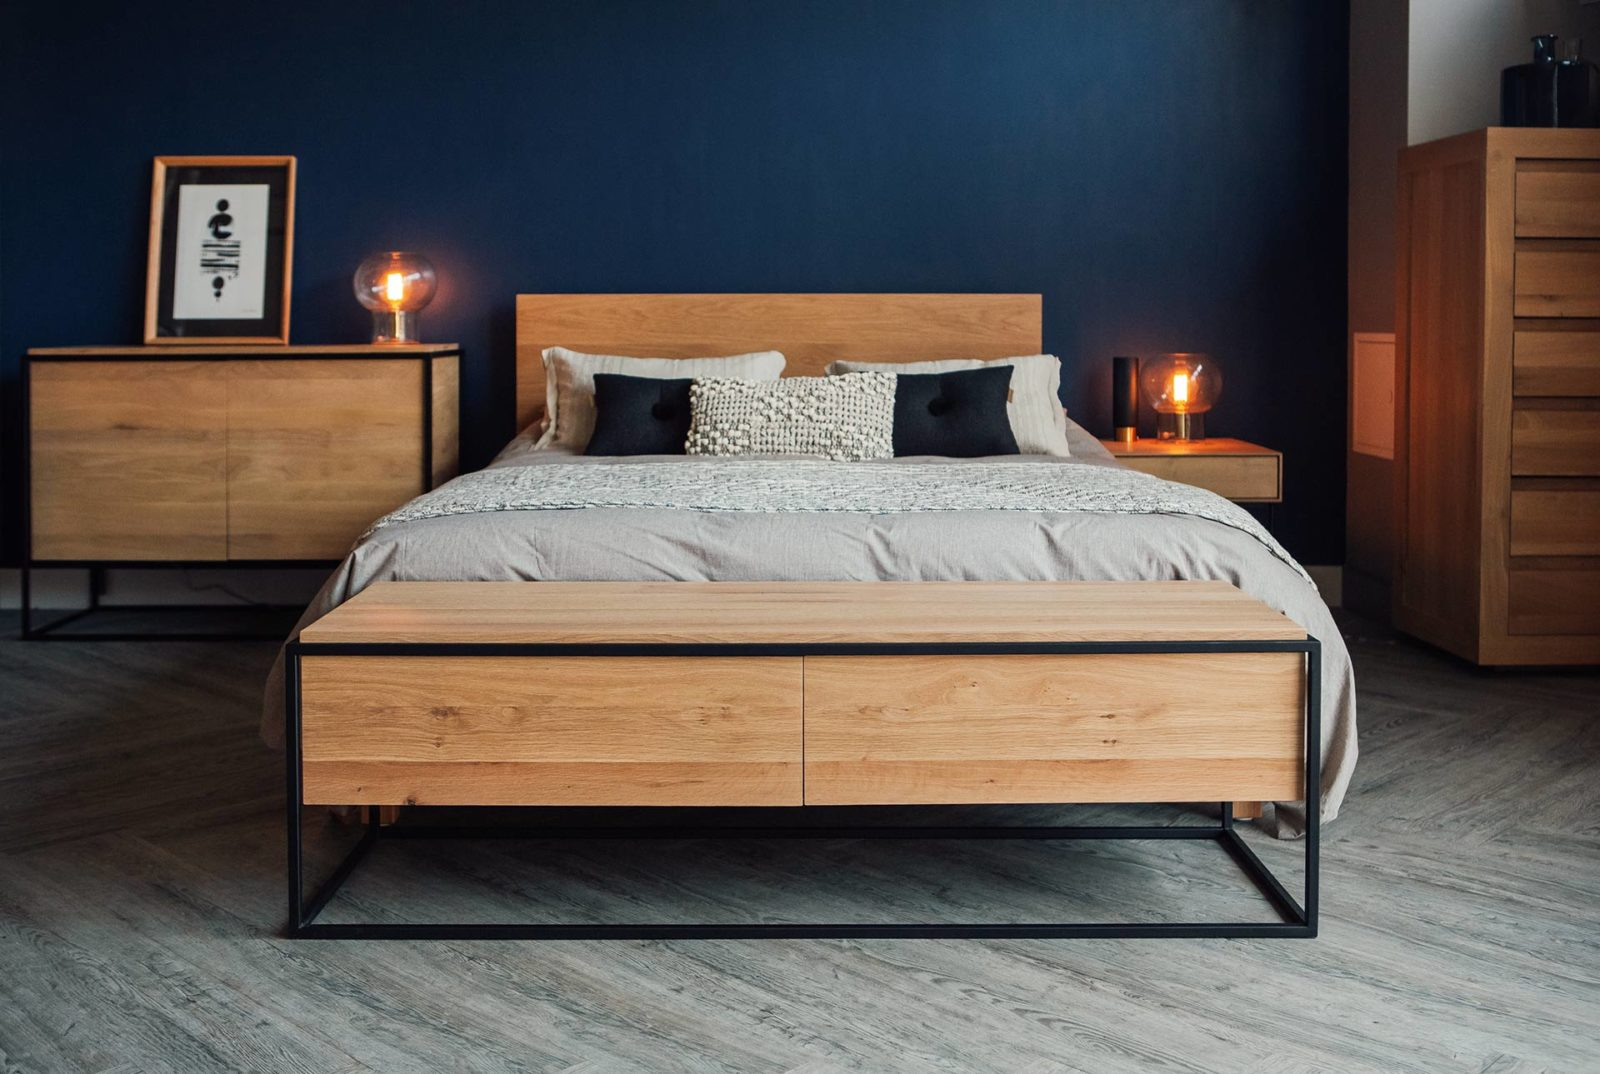 monolit-end-of-bed-storage